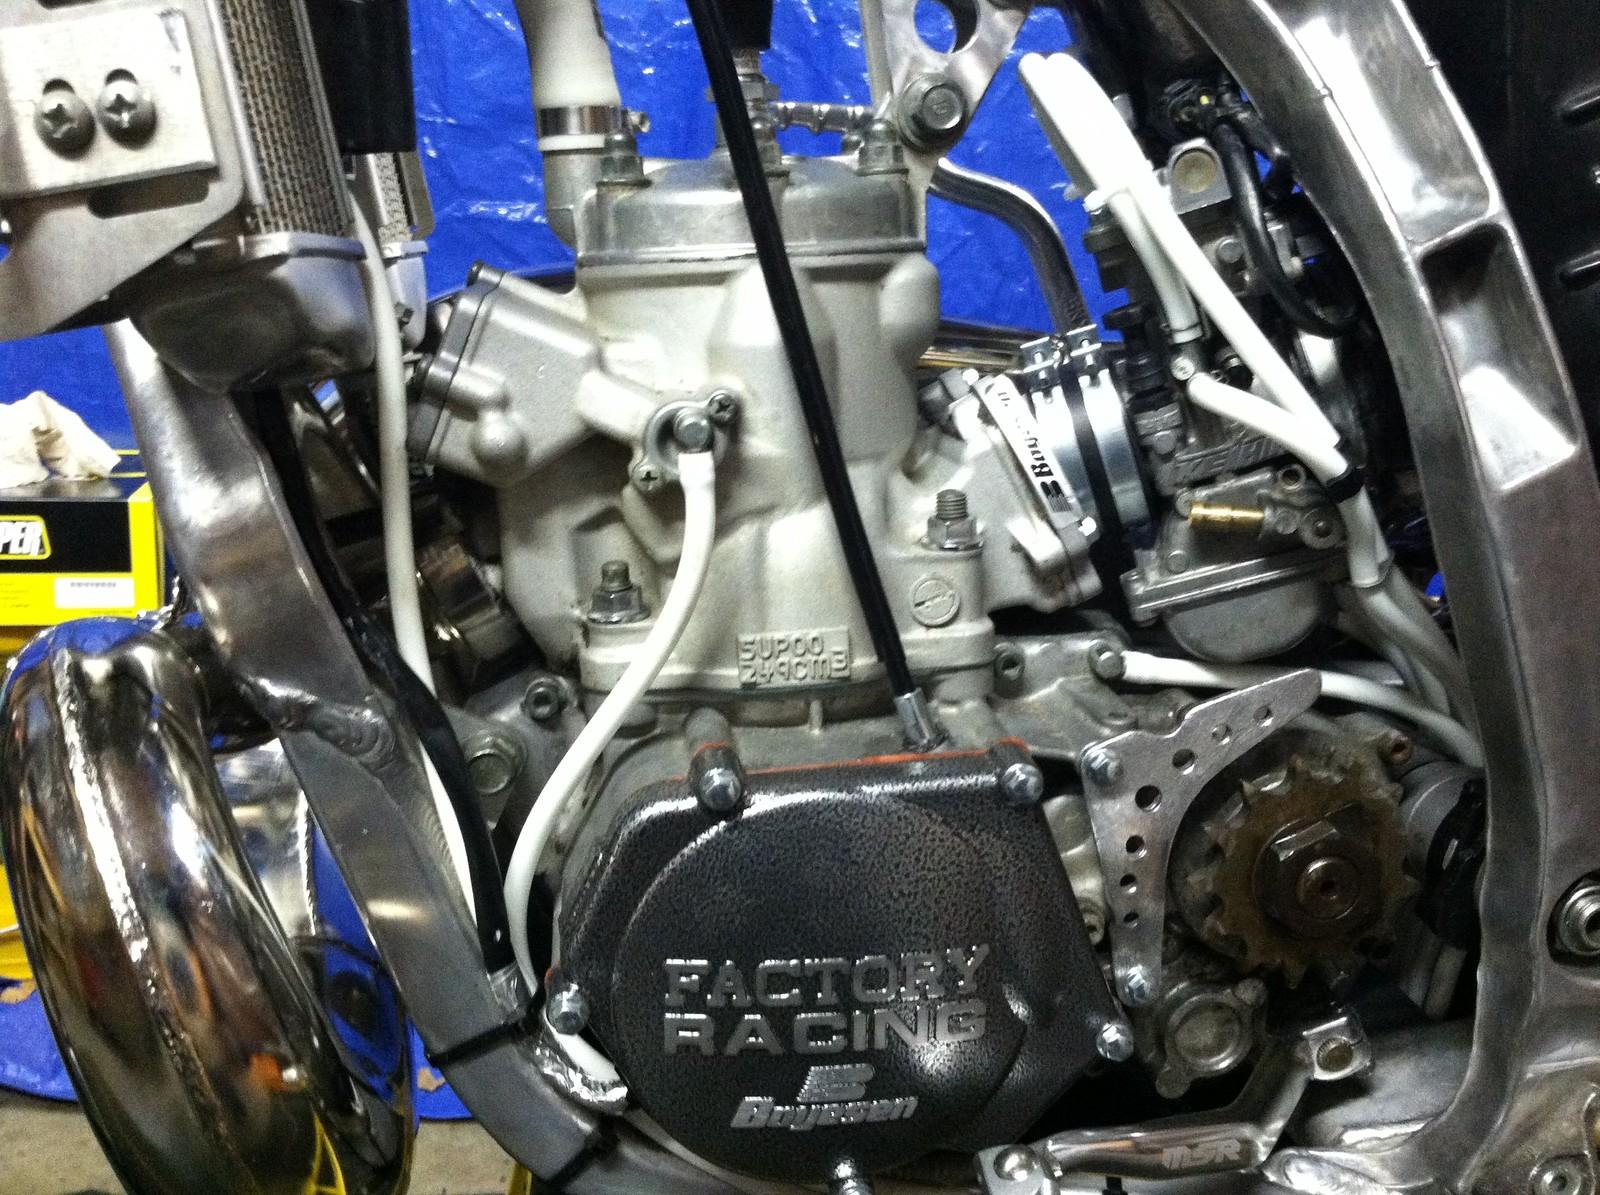 My Custom Built Yz 250 - Avilarr43 U0026 39 S Bike Check